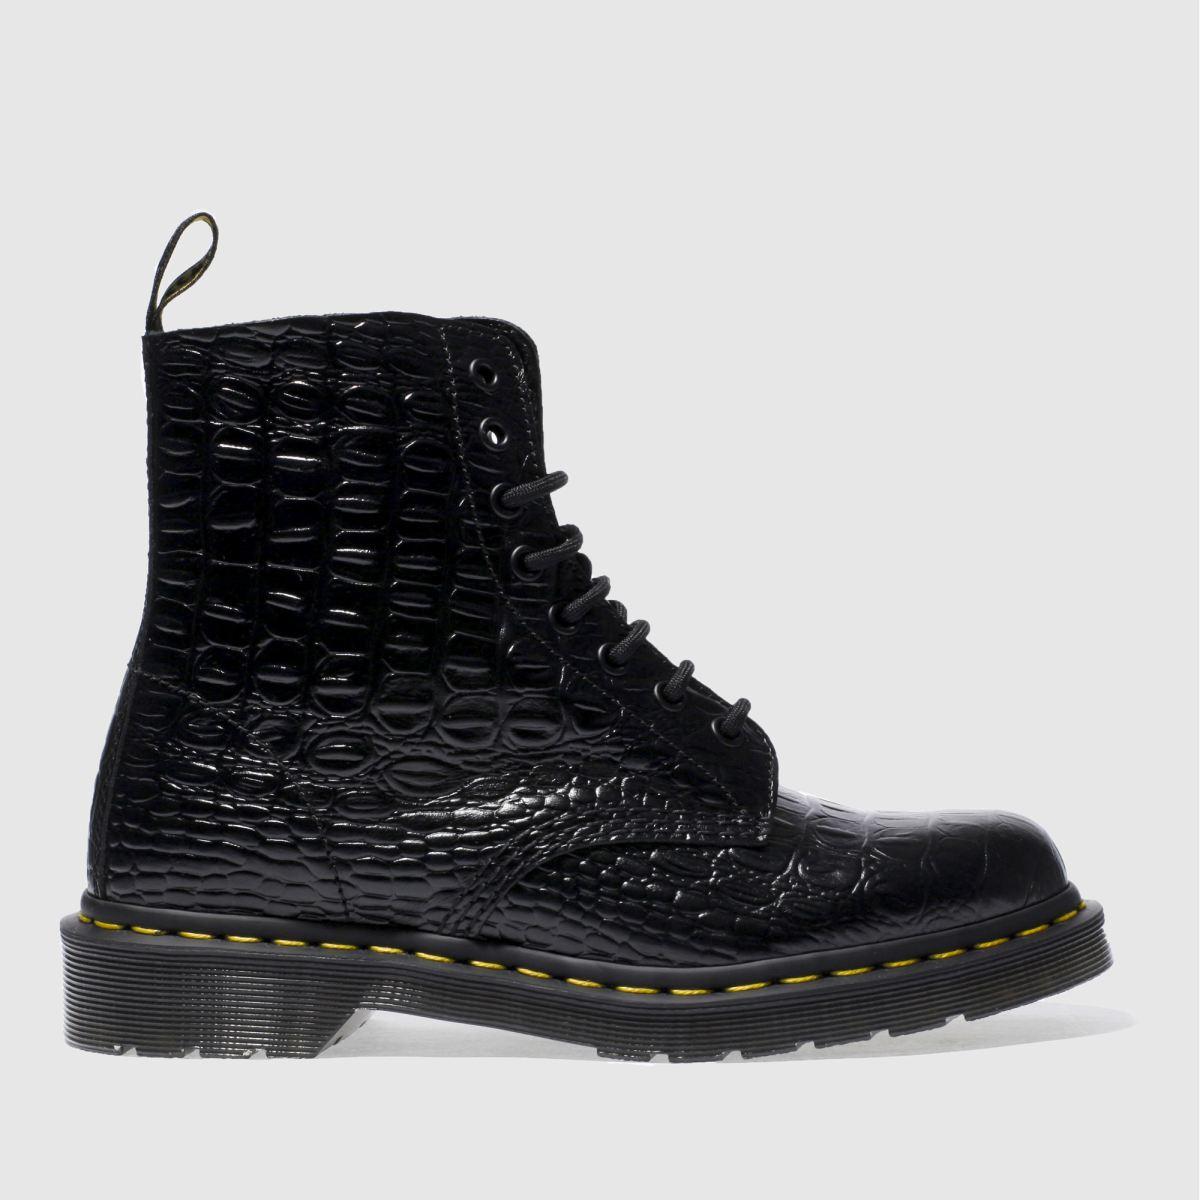 Dr Martens Black Pascal Croc 8 Eye Boots